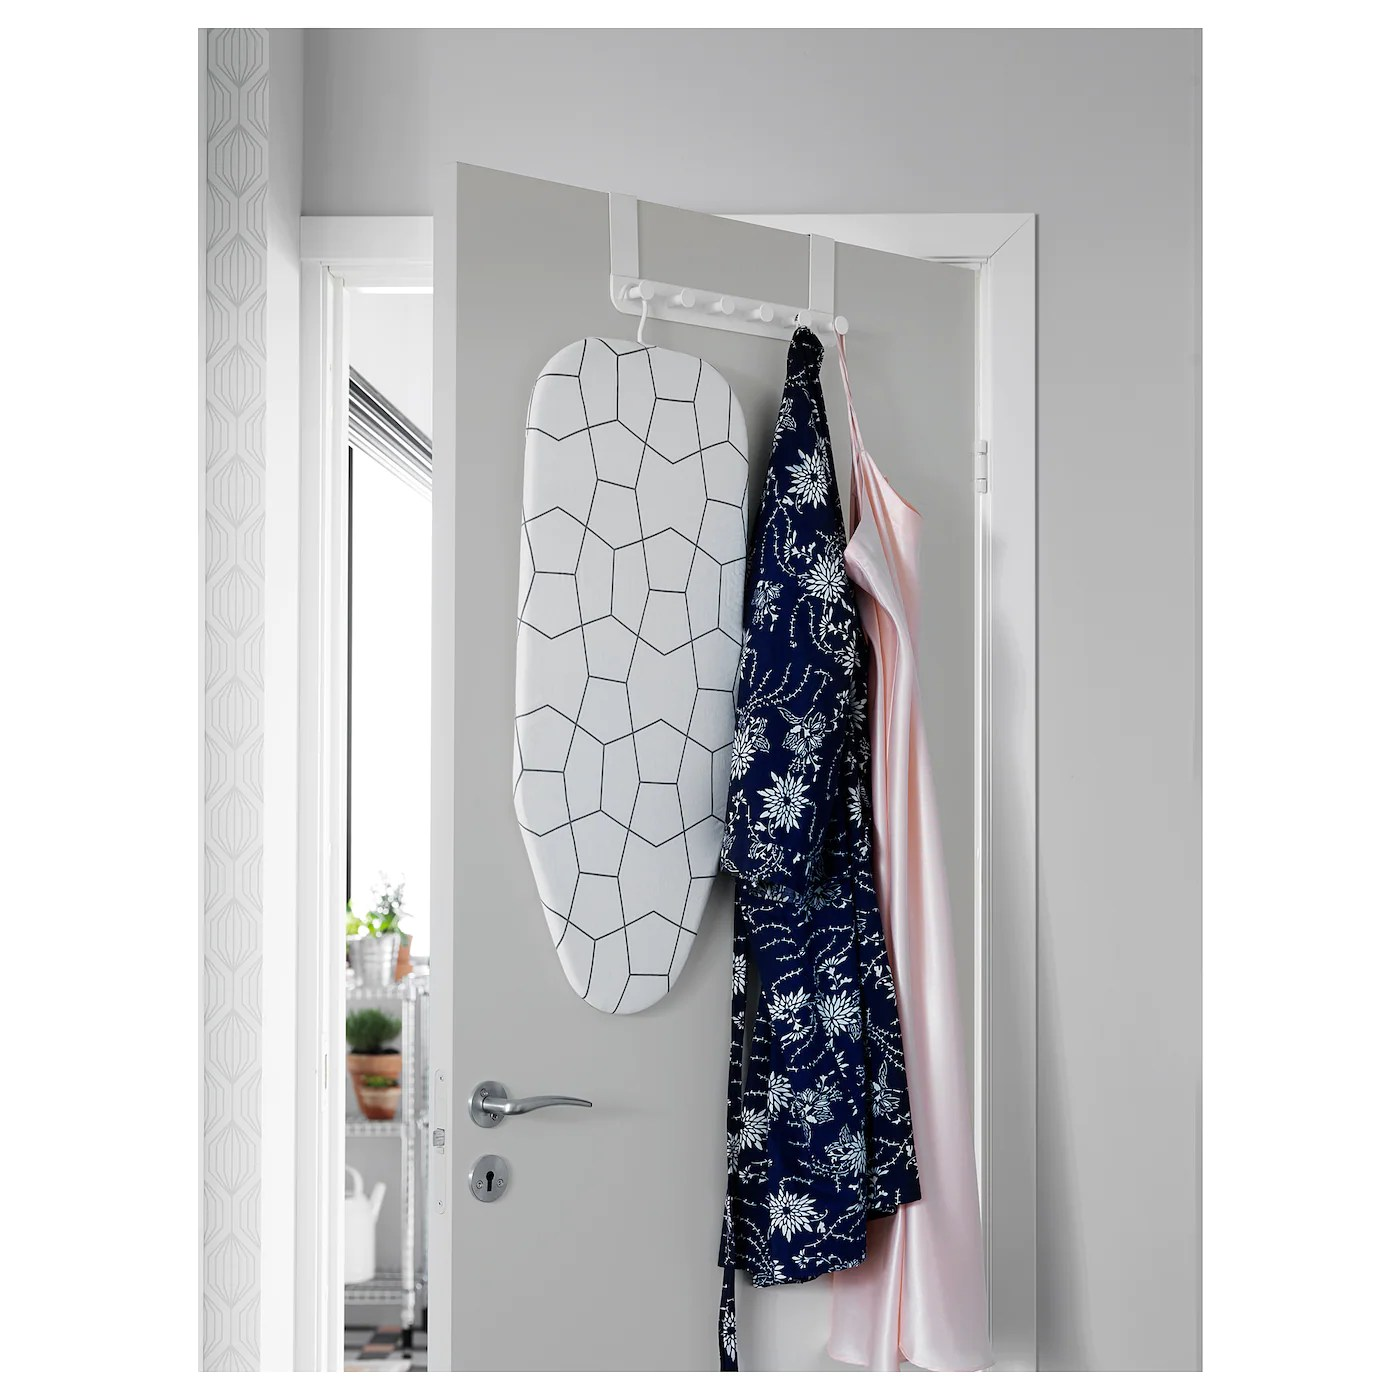 Enudden Patere Pour Porte Blanc Ikea